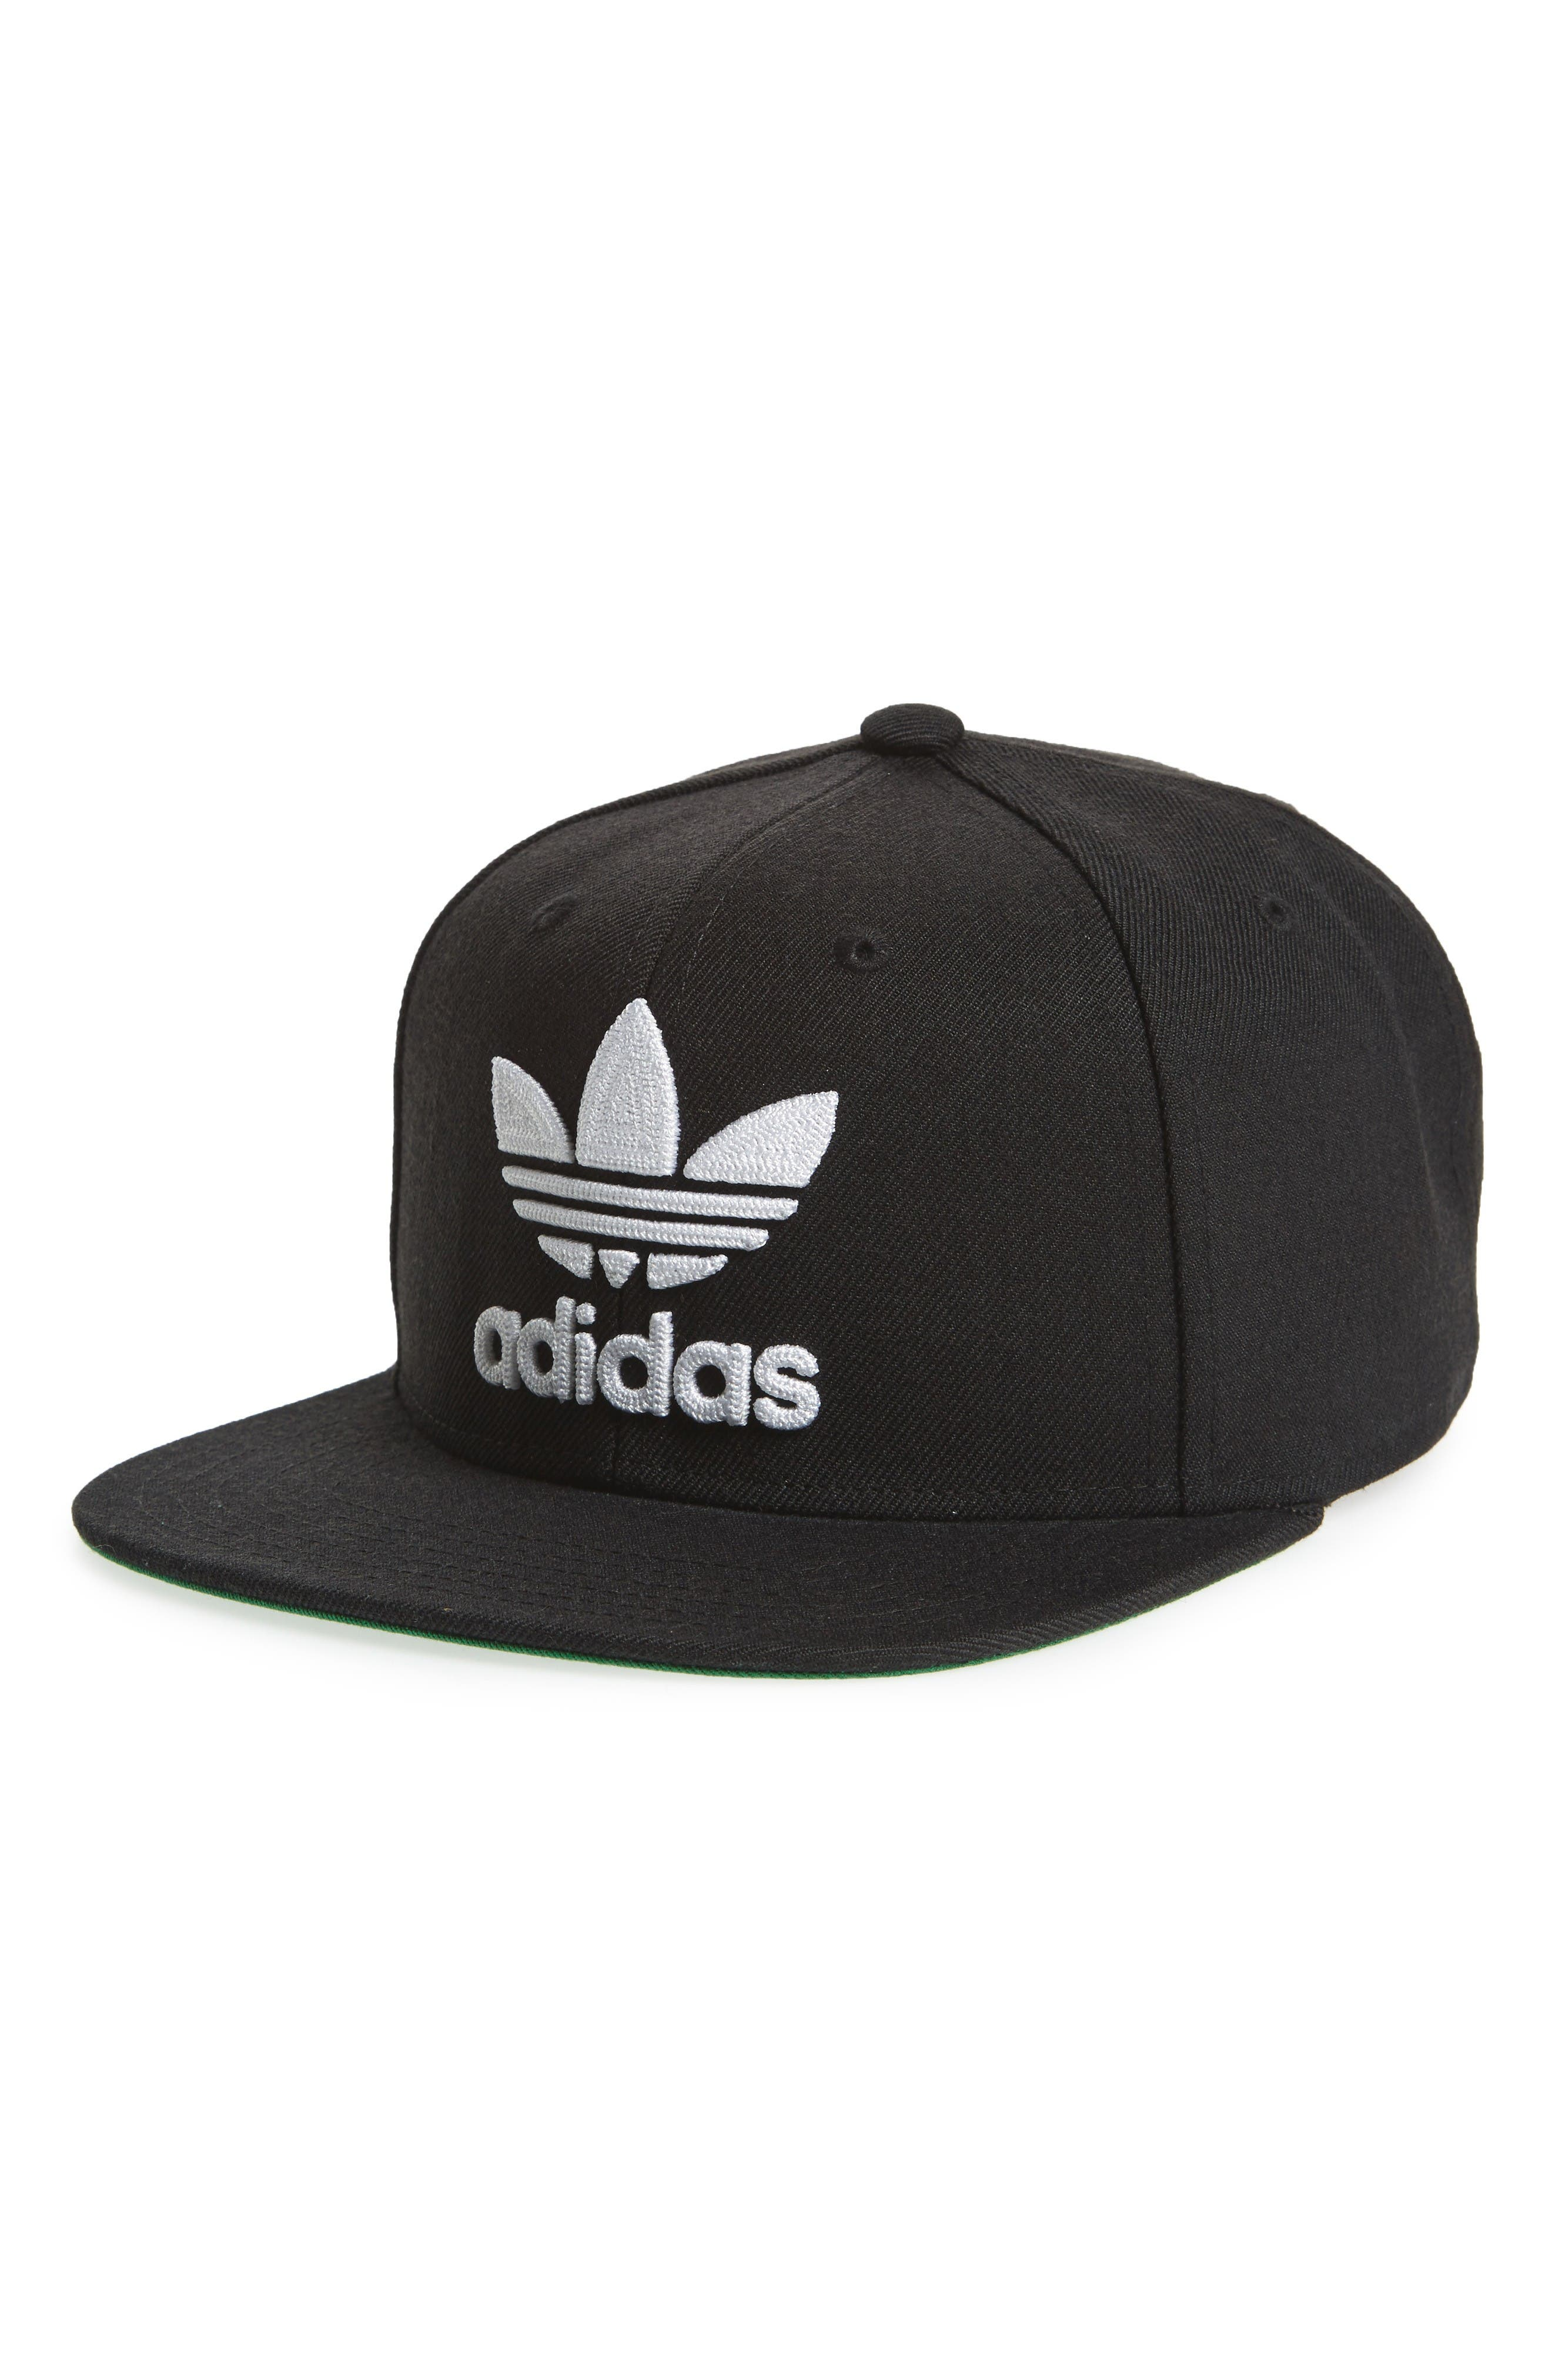 adidas Originals Trefoil Chain Snapback Baseball Cap